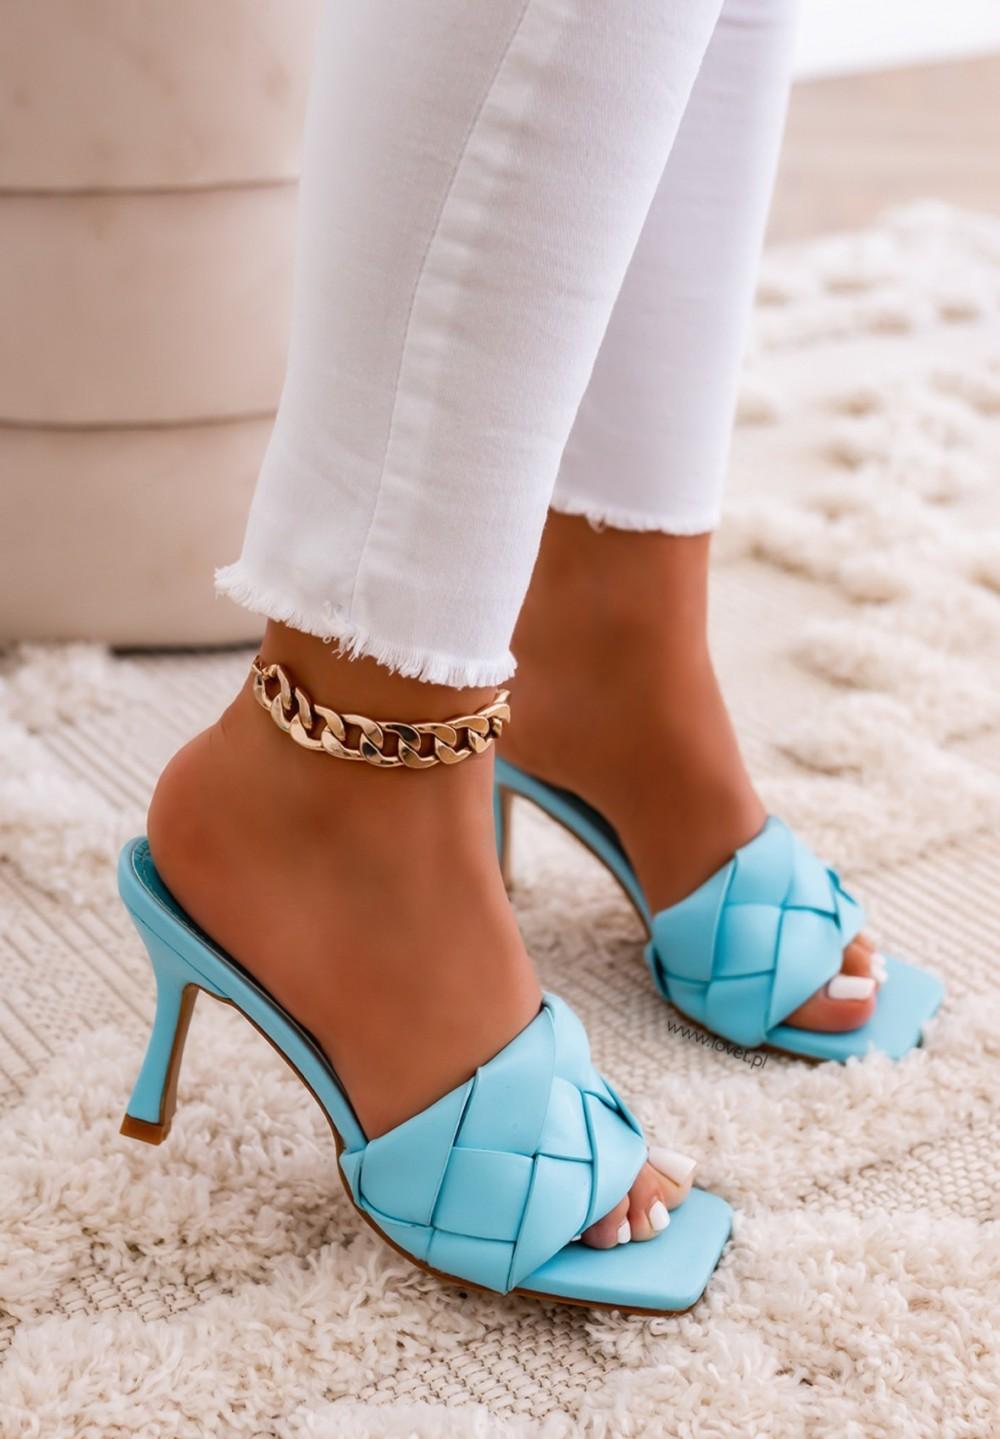 Klapki Plecione Niebieskie Kenza Heels